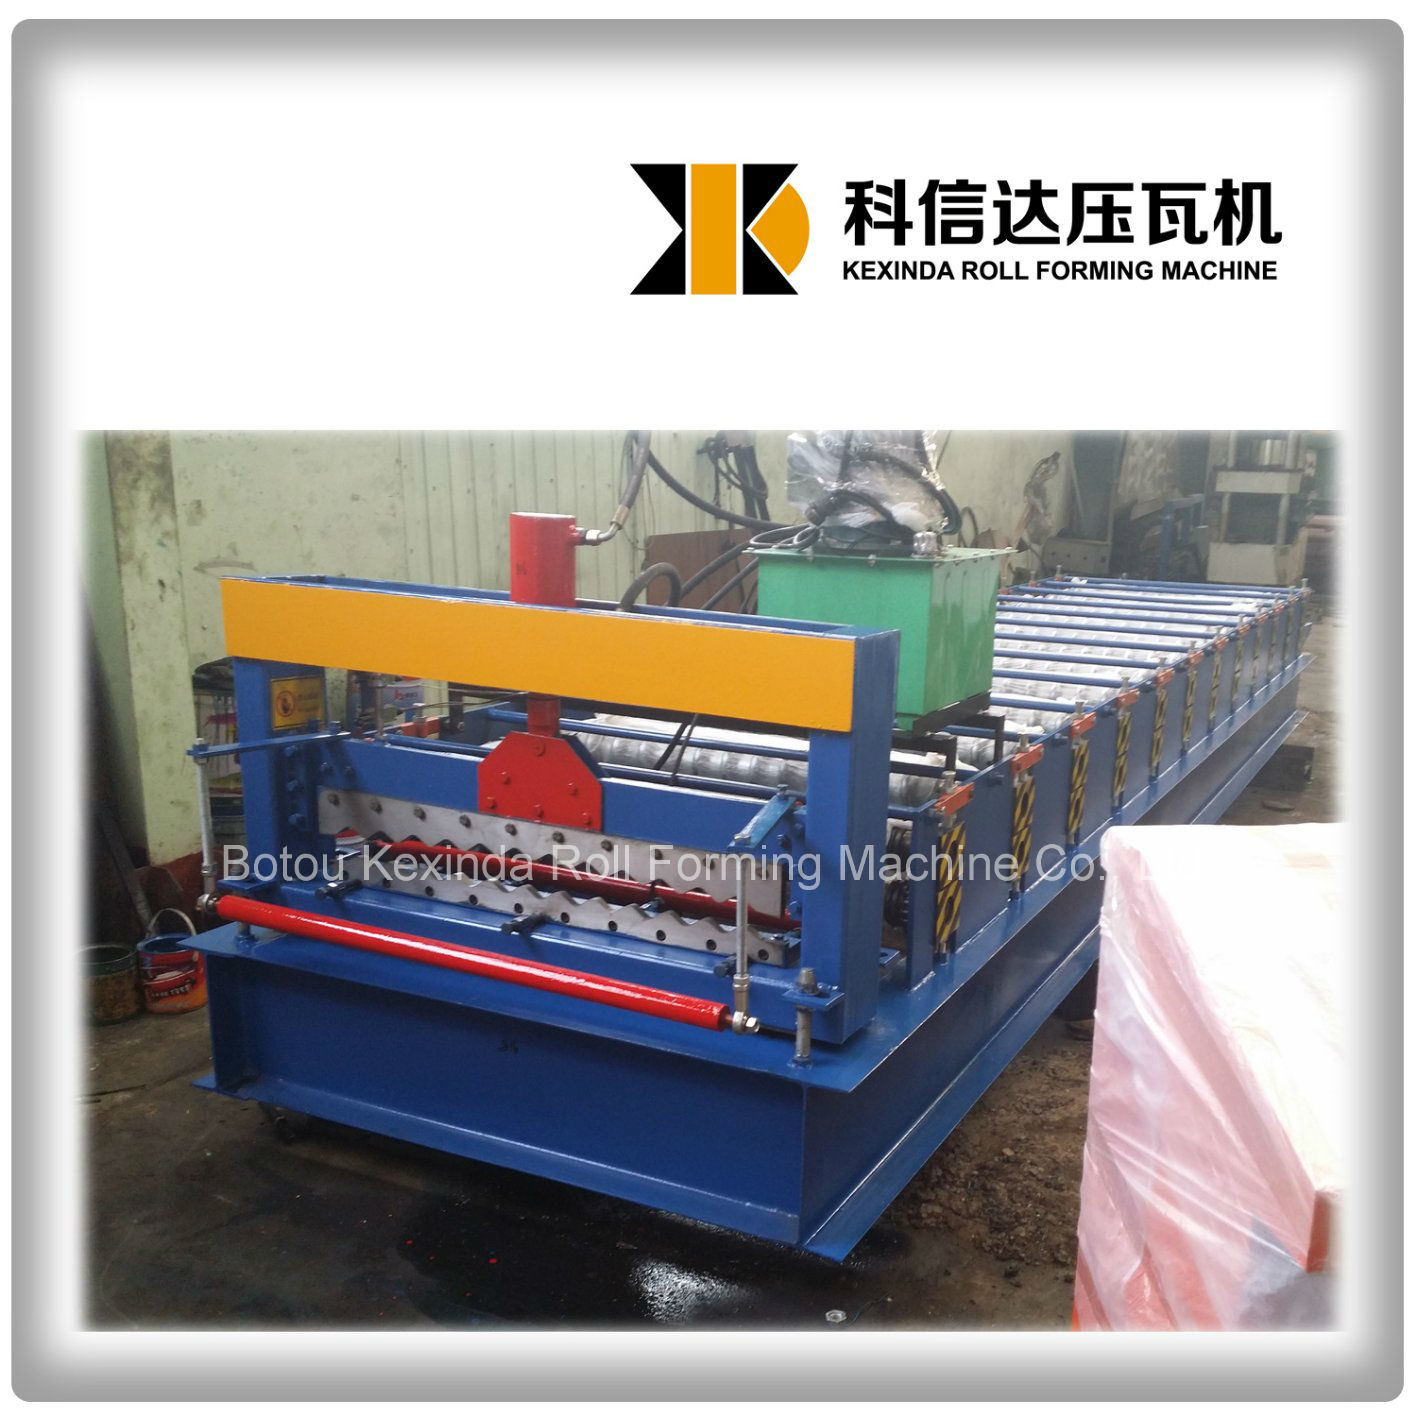 Kxd-836 Aluminium Corrugated Sheet Forming Machine Roof Tile Making Machine